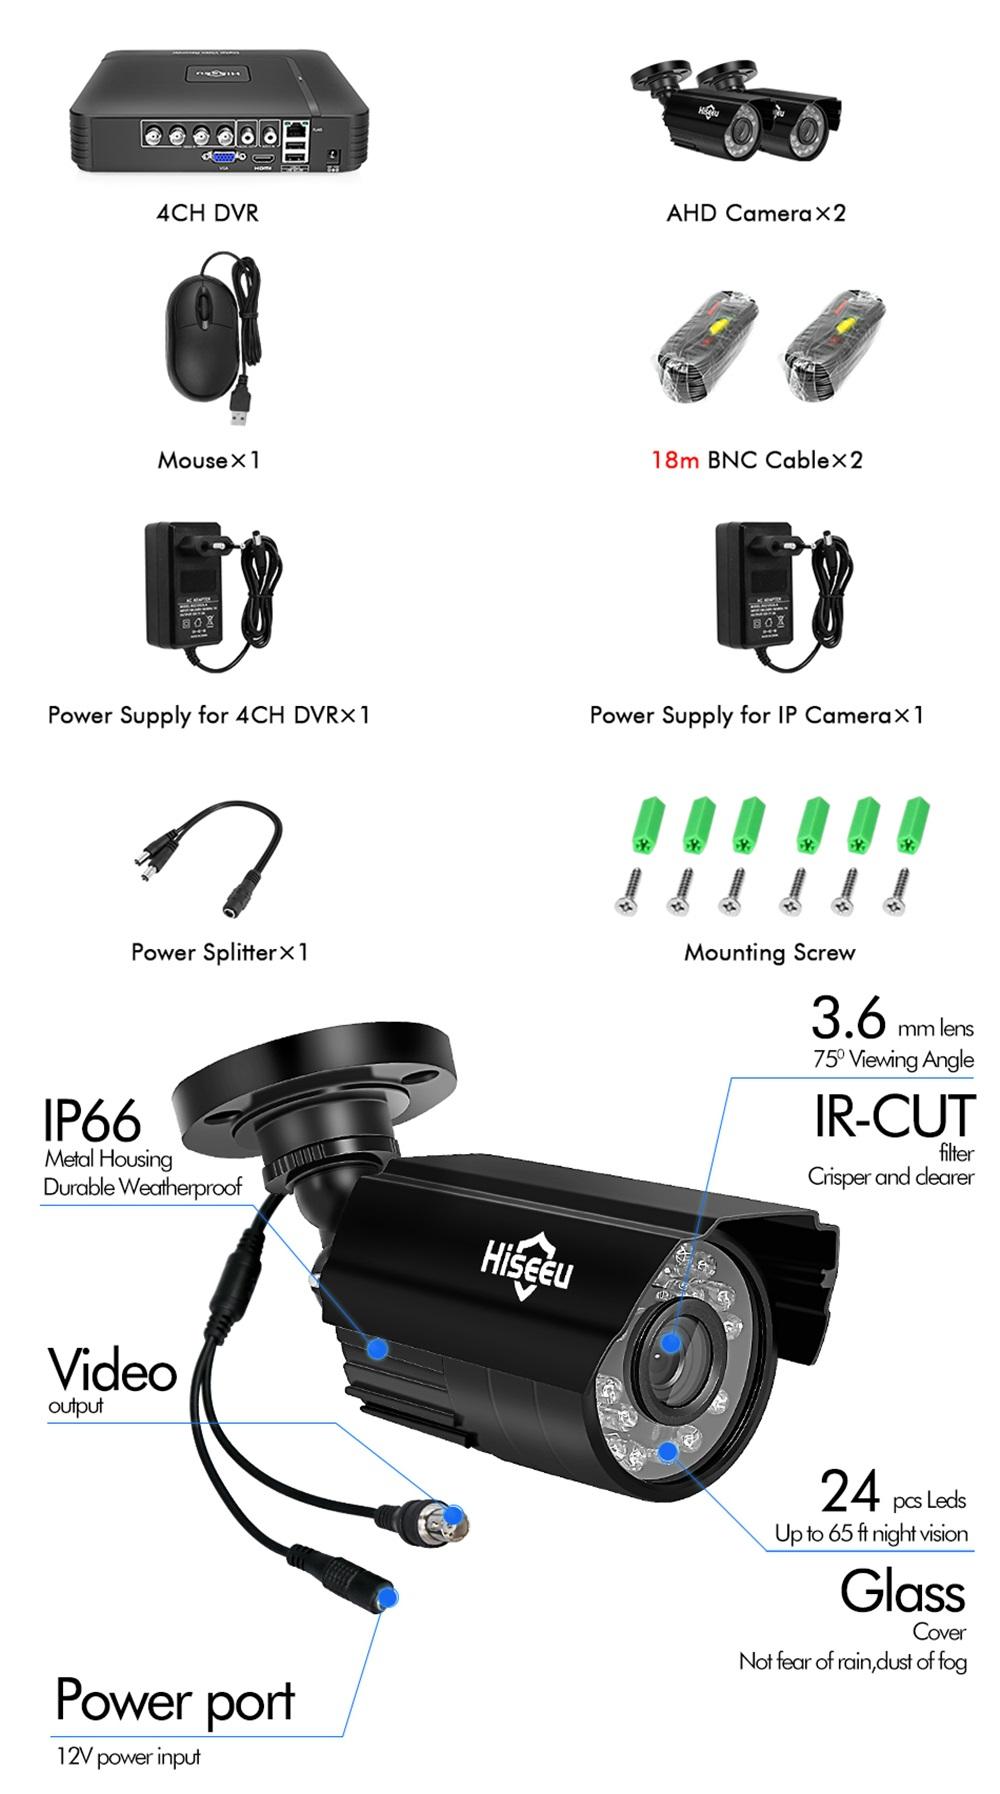 Hiseeu HD 4CH 1080N 5 in 1 AHD DVR Kit CCTV System 2pcs 720P AHD Waterproof  IR Camera P2P Security Surveillance Set